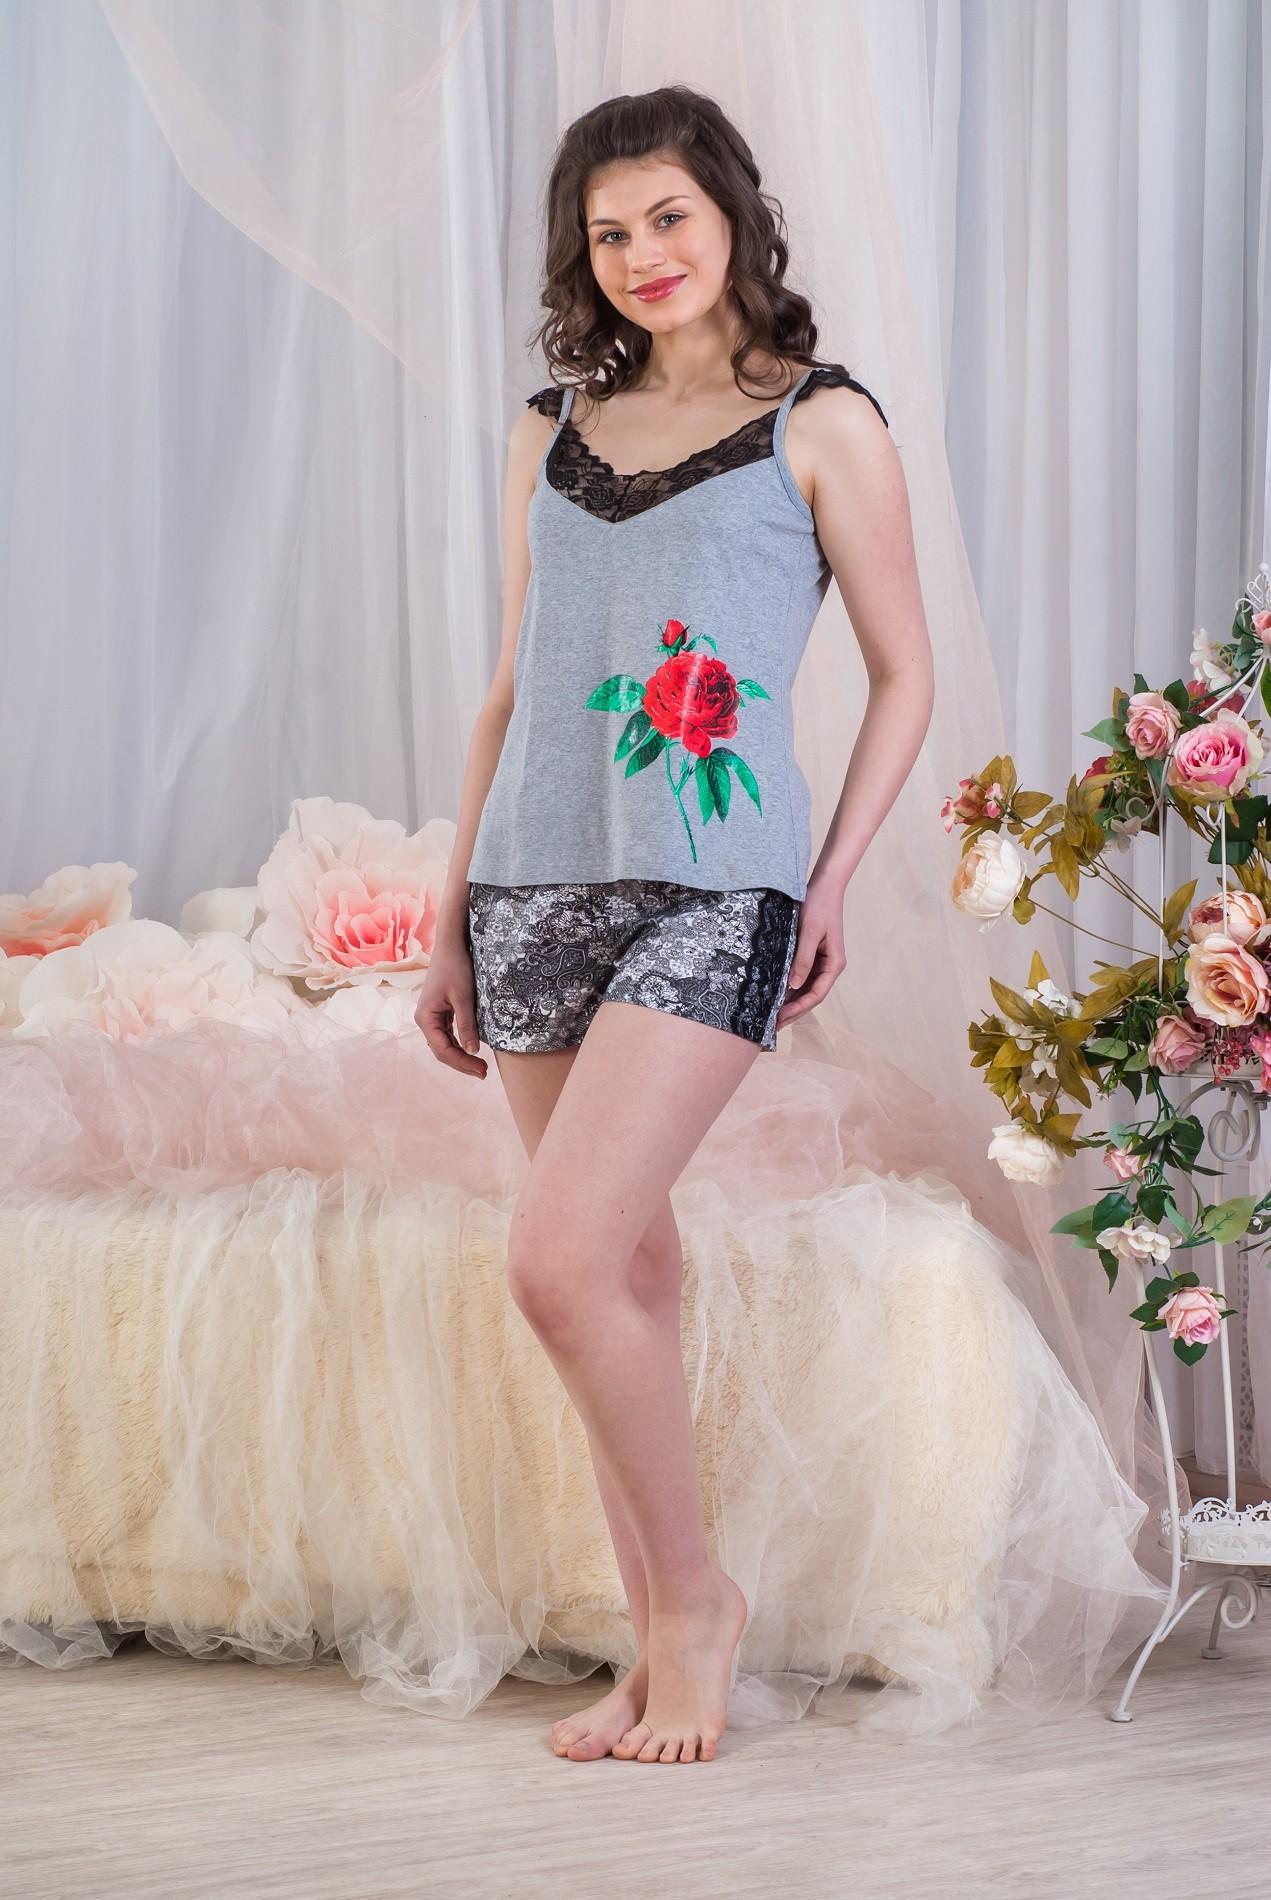 Пижама женская Узоры майка и шортыДомашняя одежда<br><br><br>Размер: 40